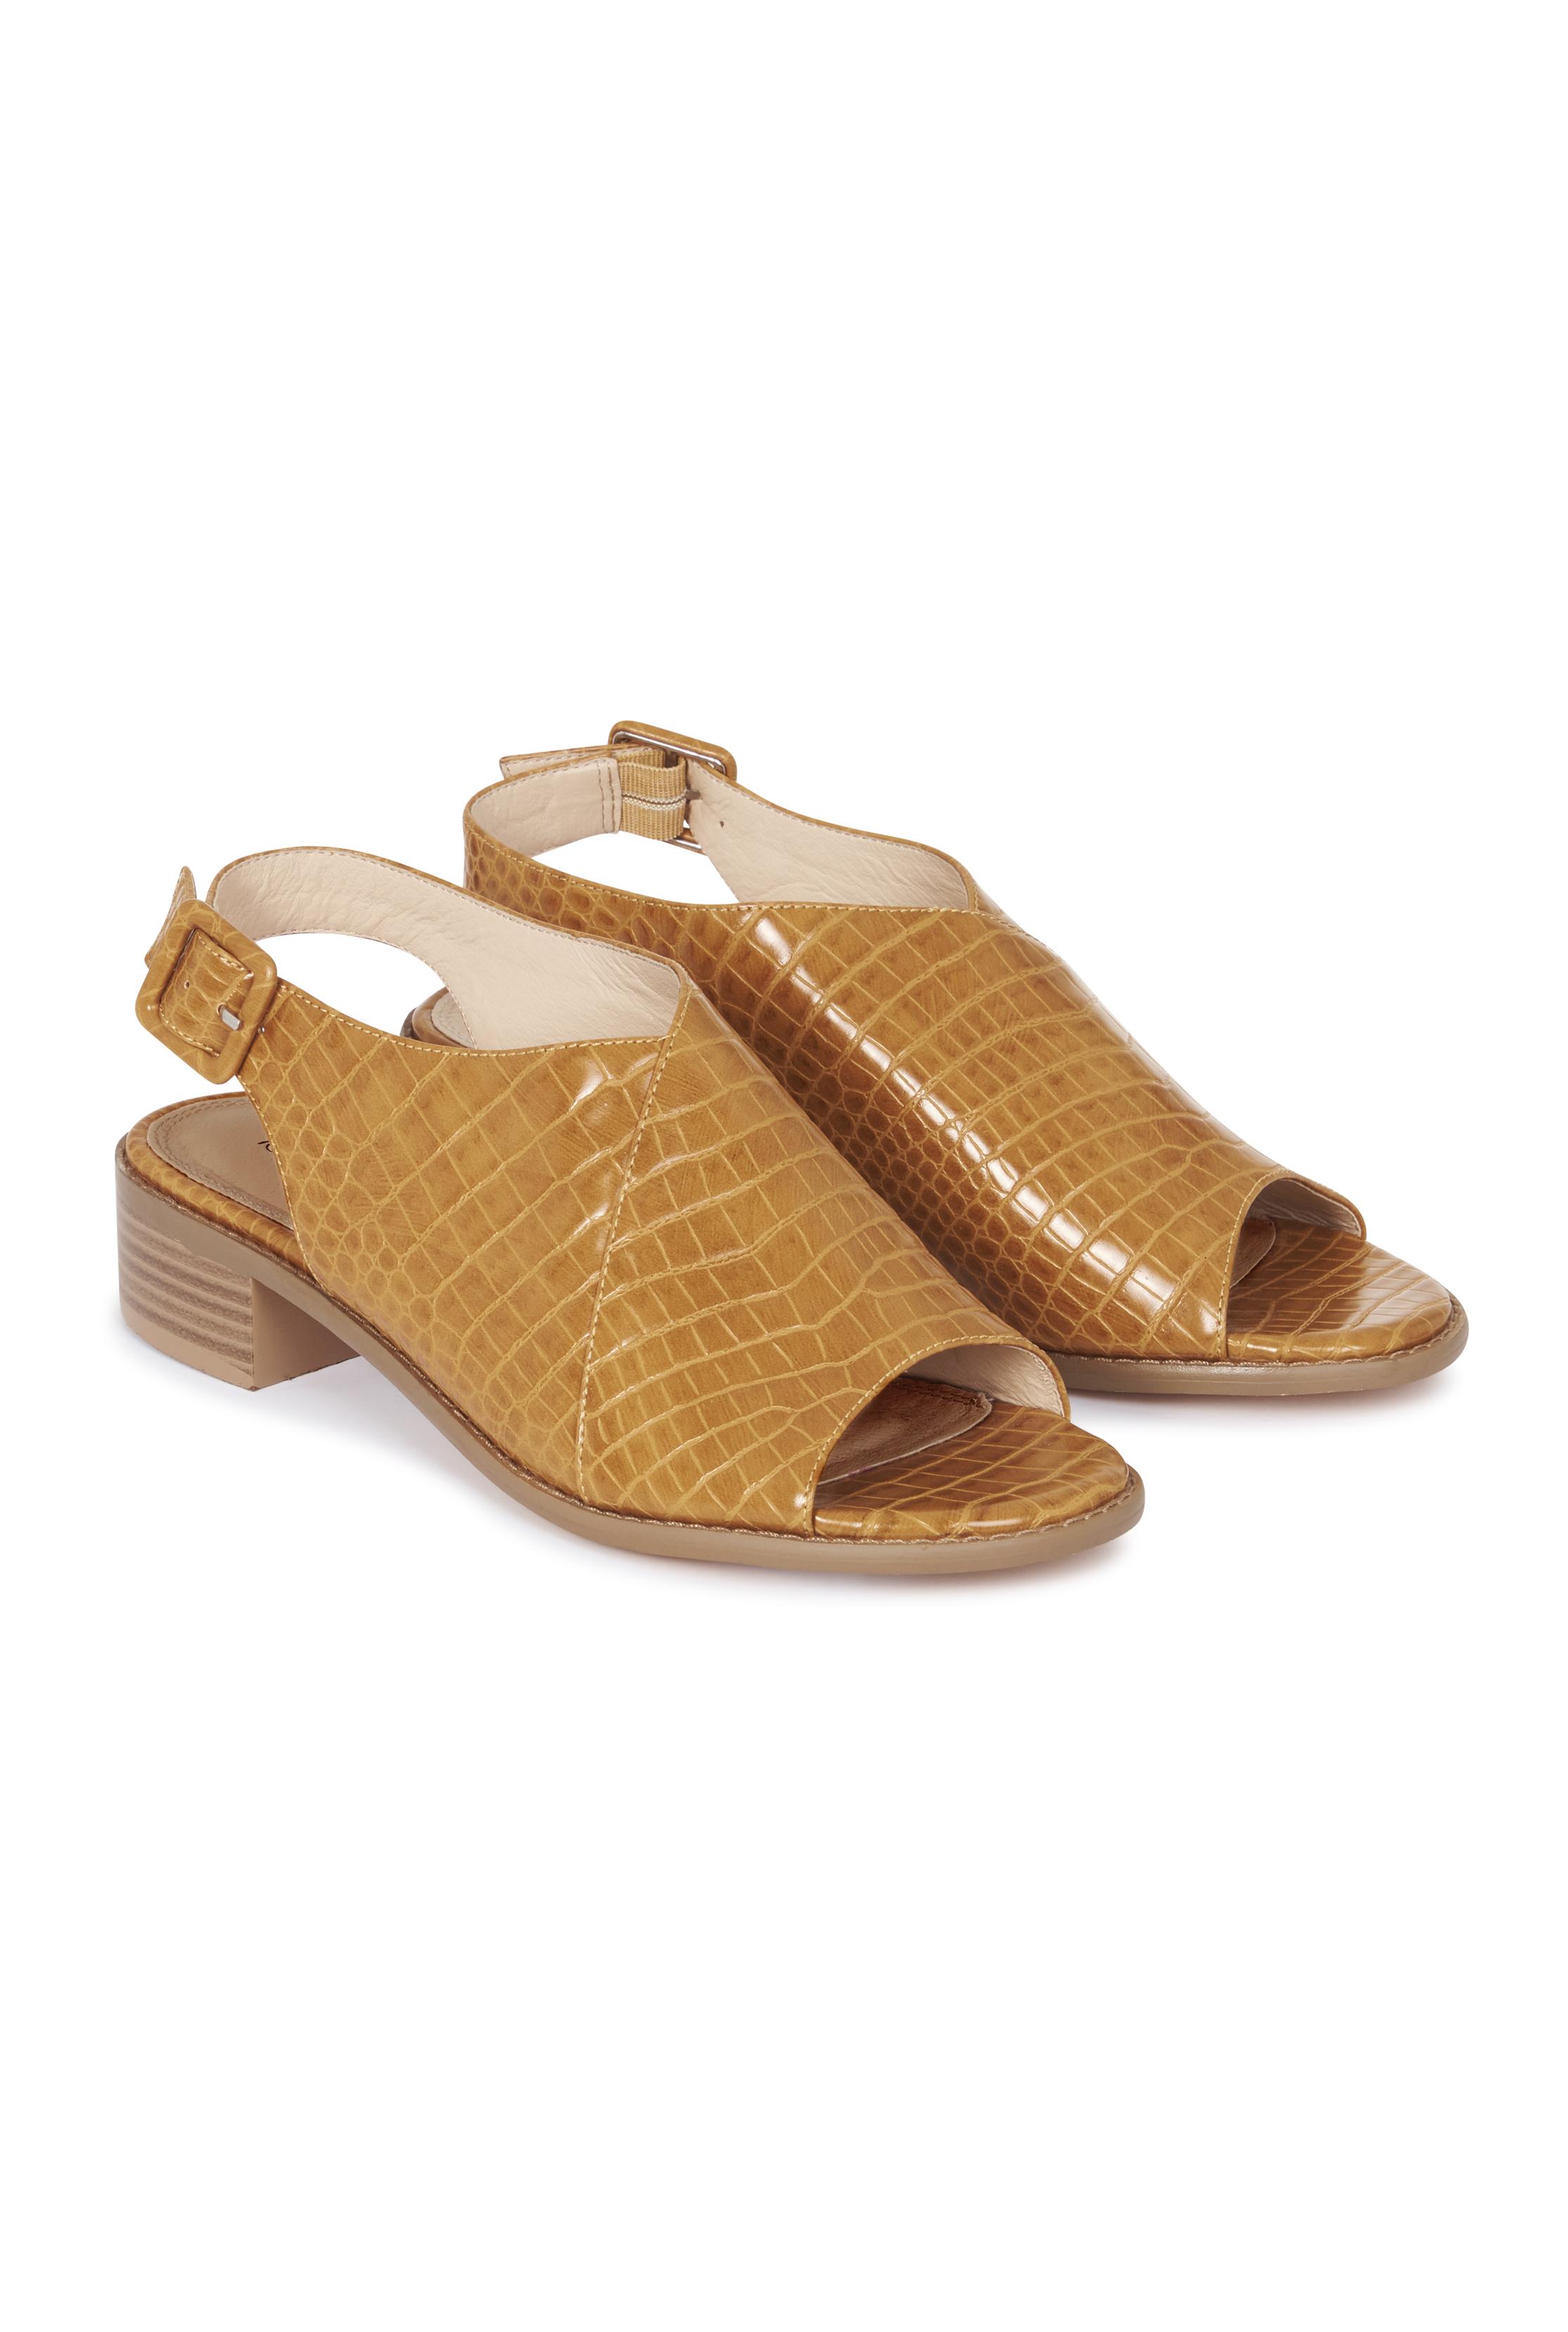 Mustard Yellow Croc Slingback Heeled Sandals